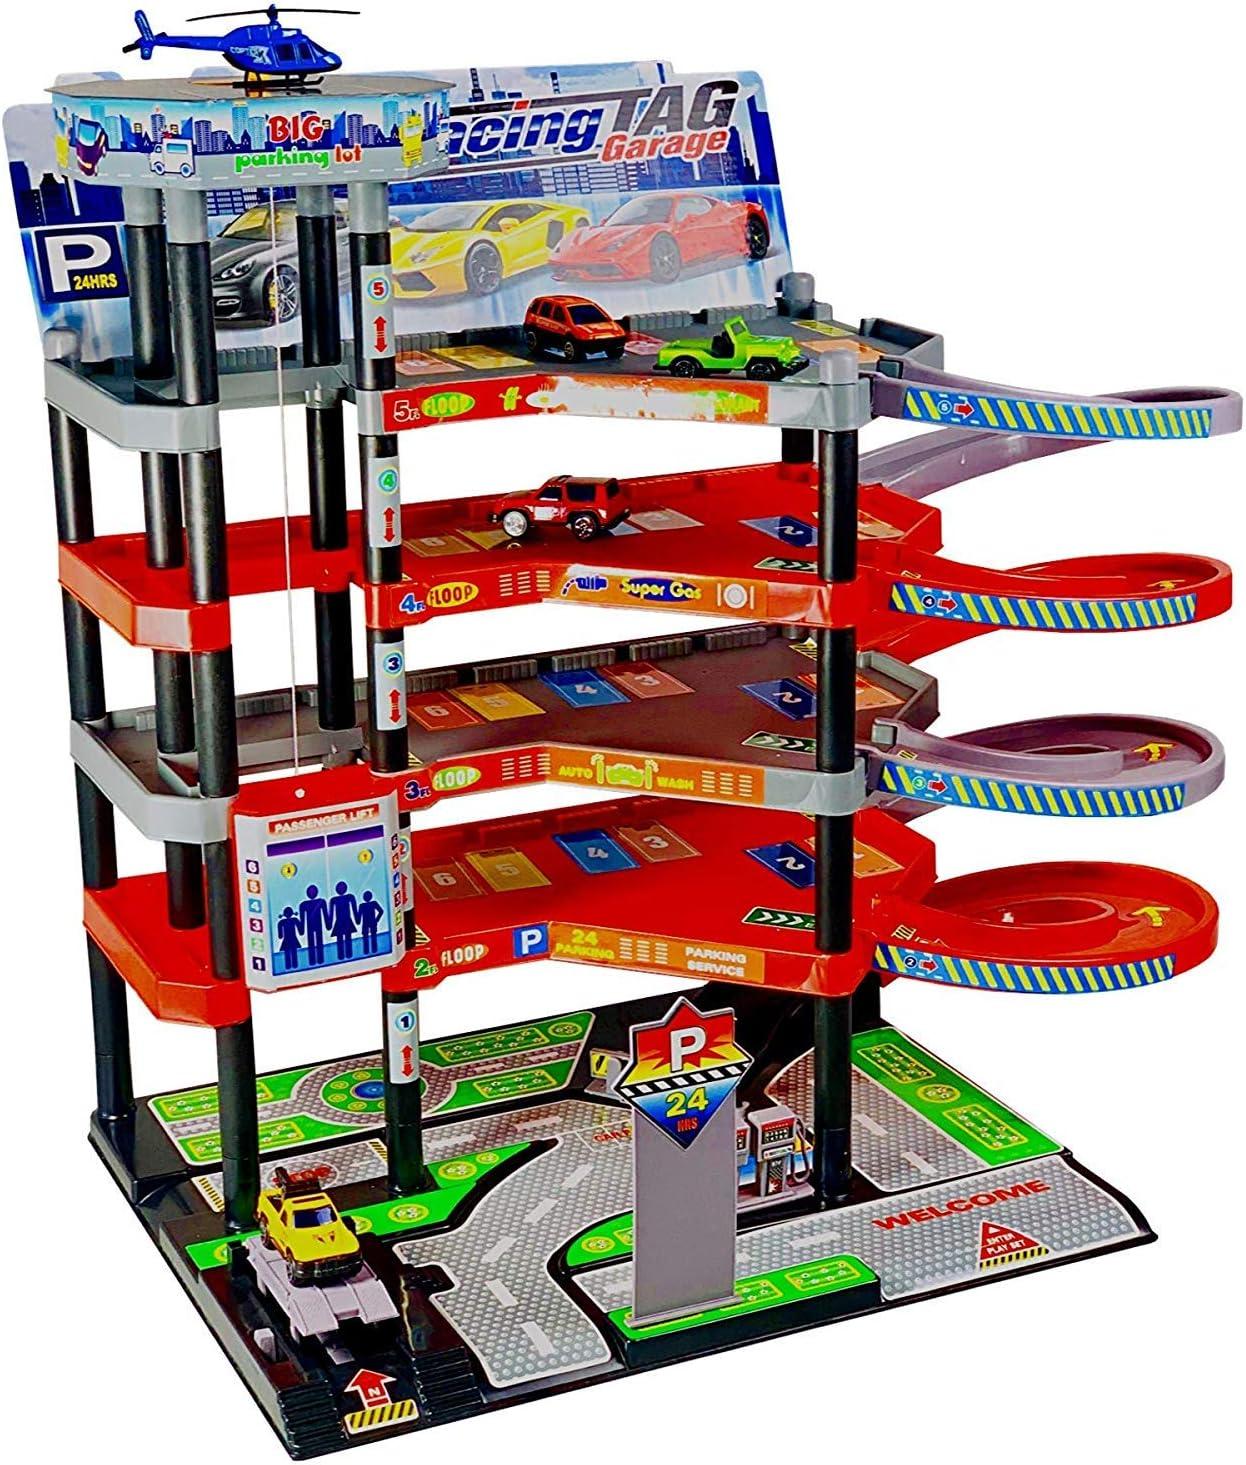 Park Garage Toys for Children with 5 Levels I Car Garage Parking Garage Garage Incl. 4 Toy Cars and Helicopter I Game Set with Petrol Station,